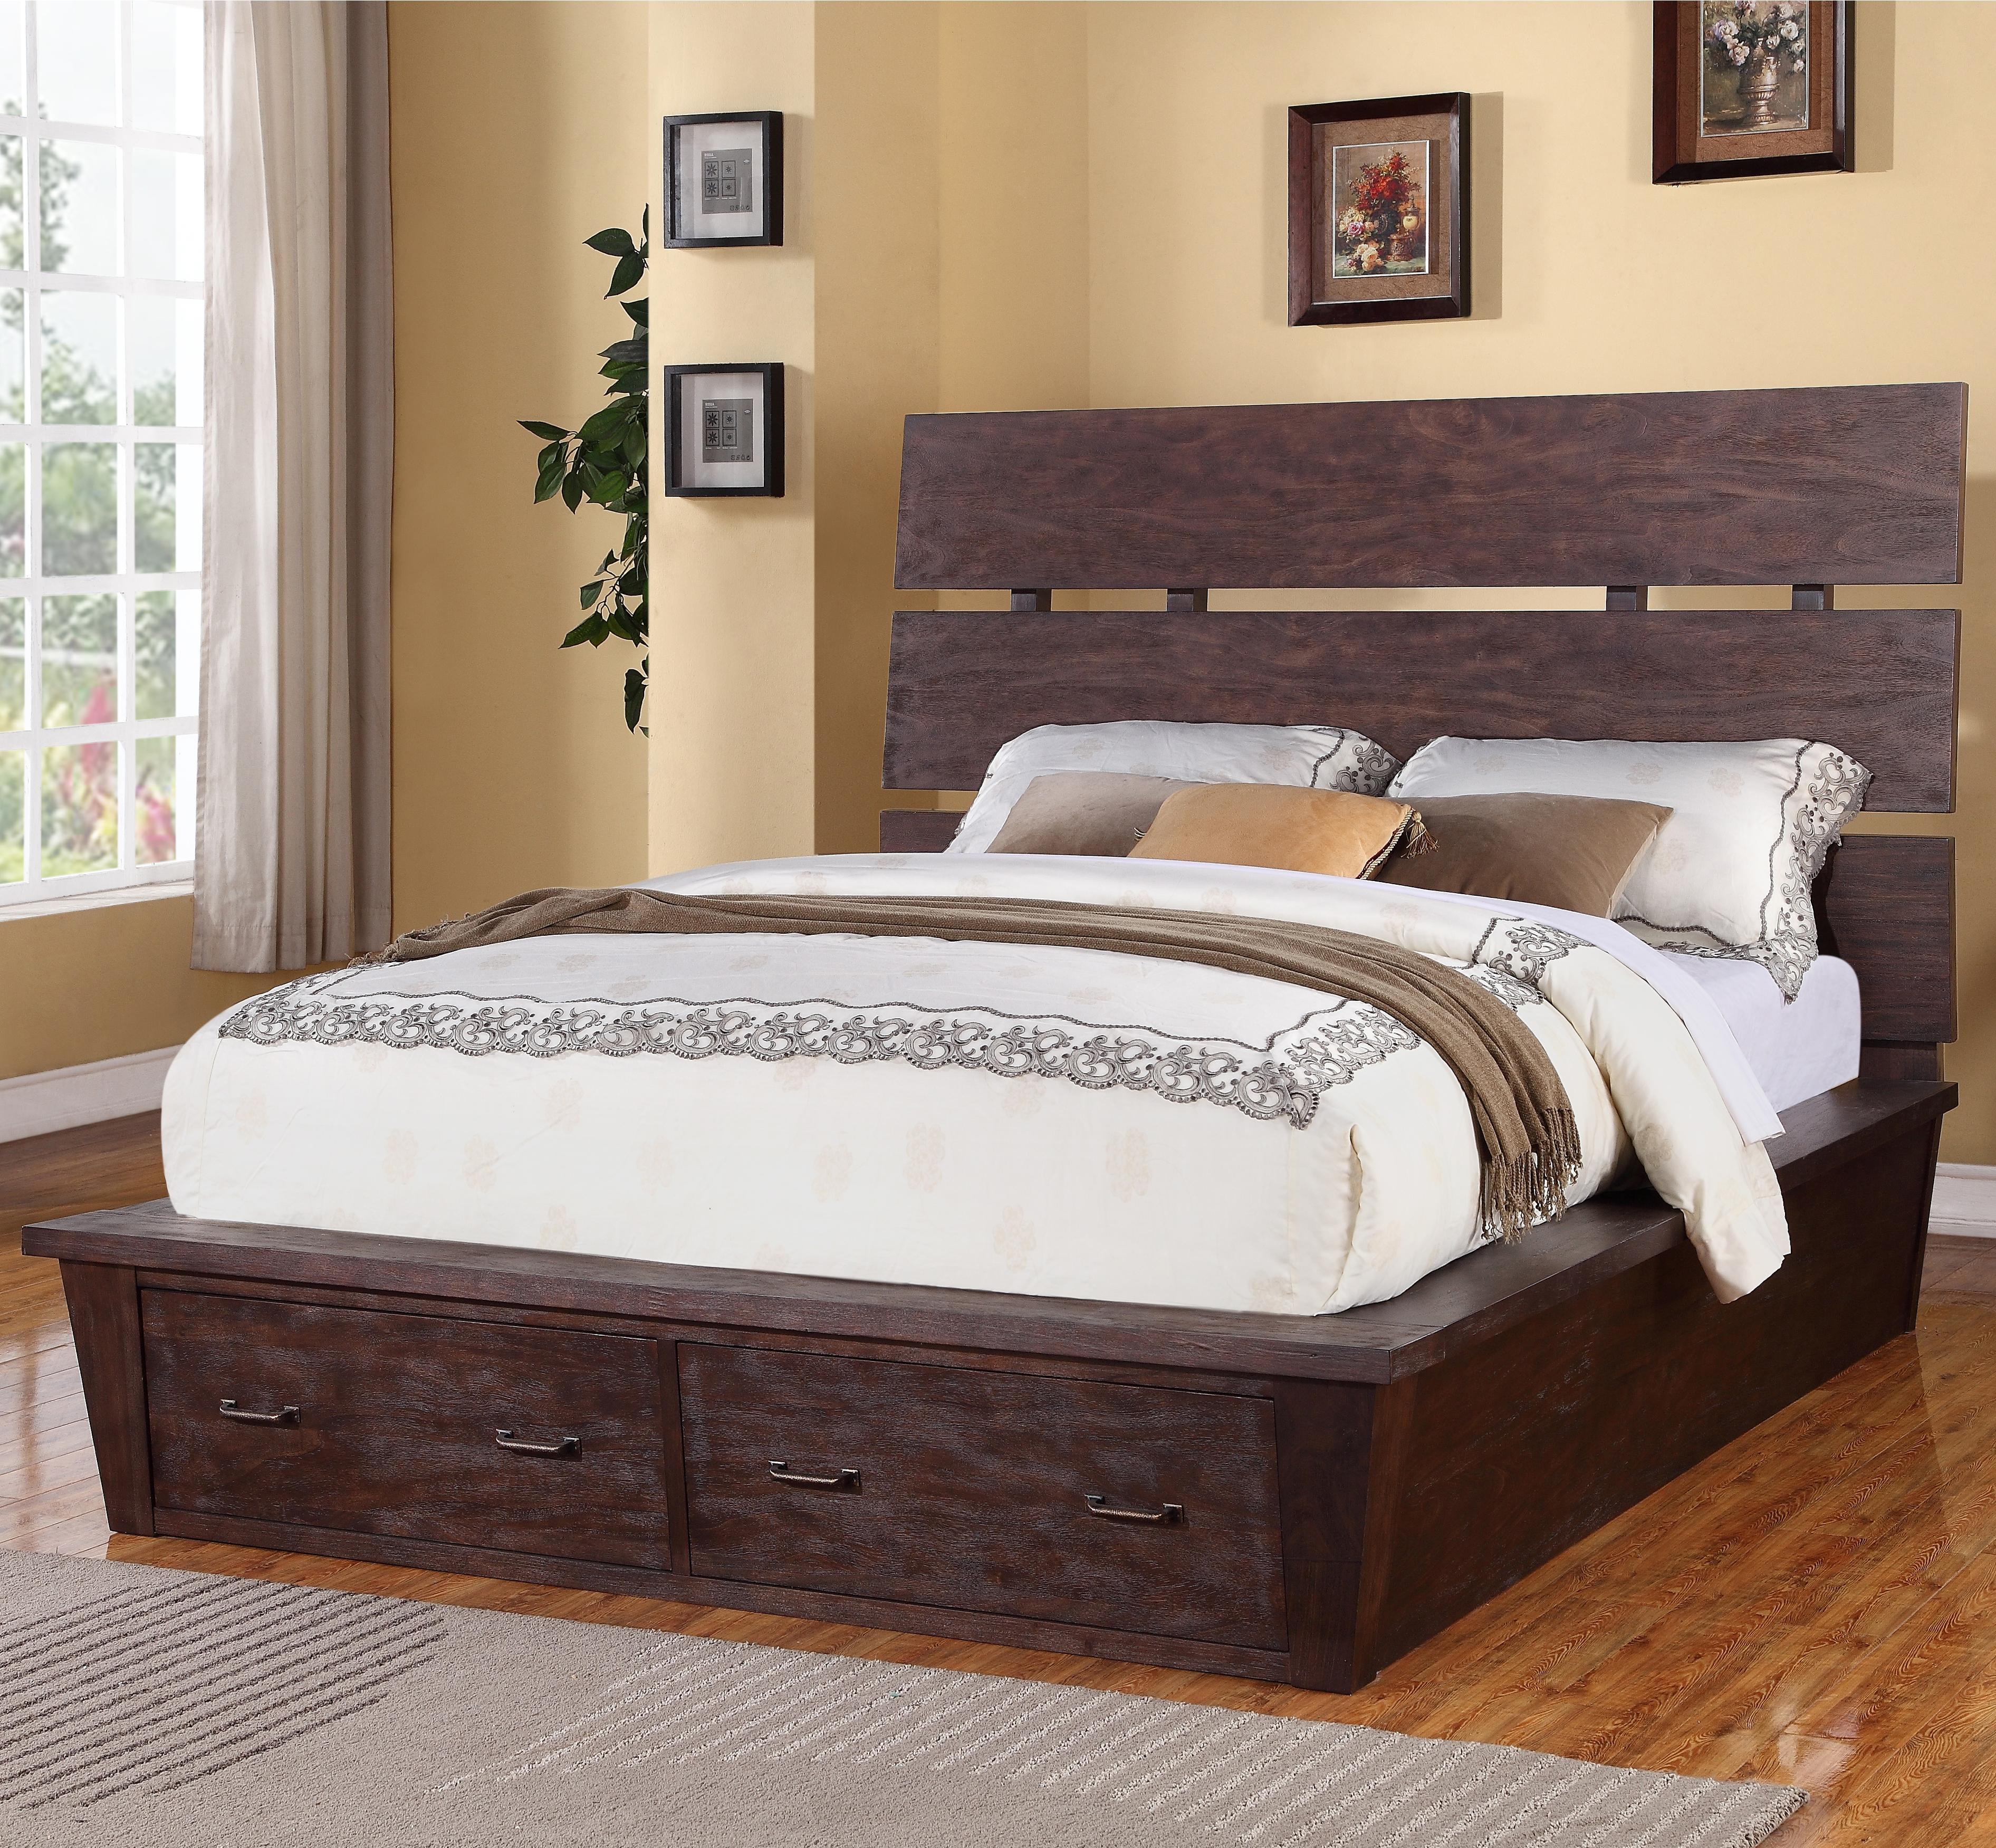 Promenade King Platform Storage Bed With 2 Drawers By Riverside Furniture Wolf Furniture